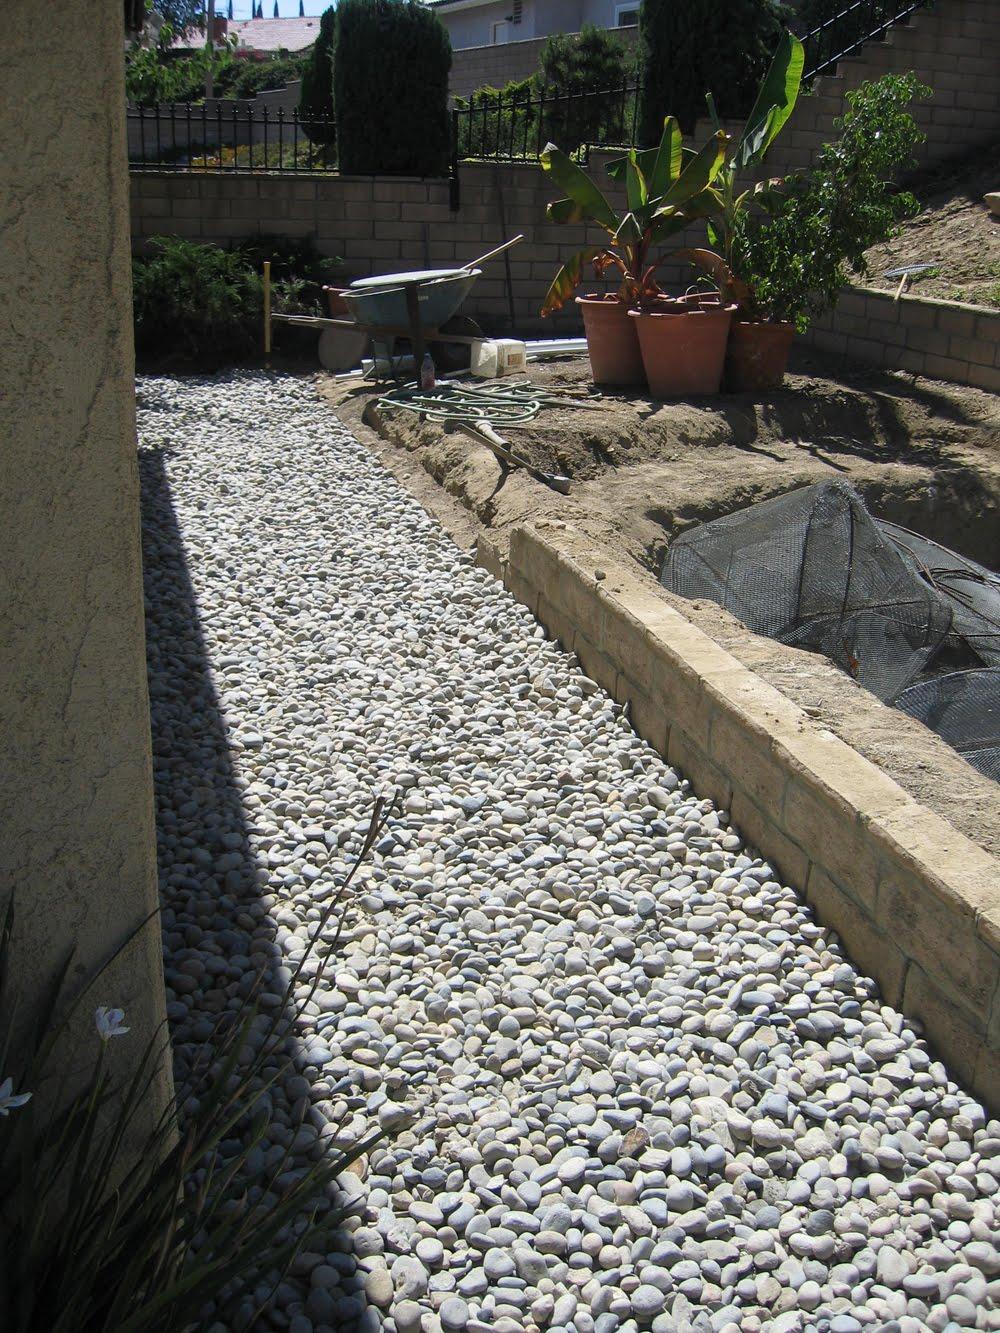 Japanese Garden Koi Pond: River rock walkway installation